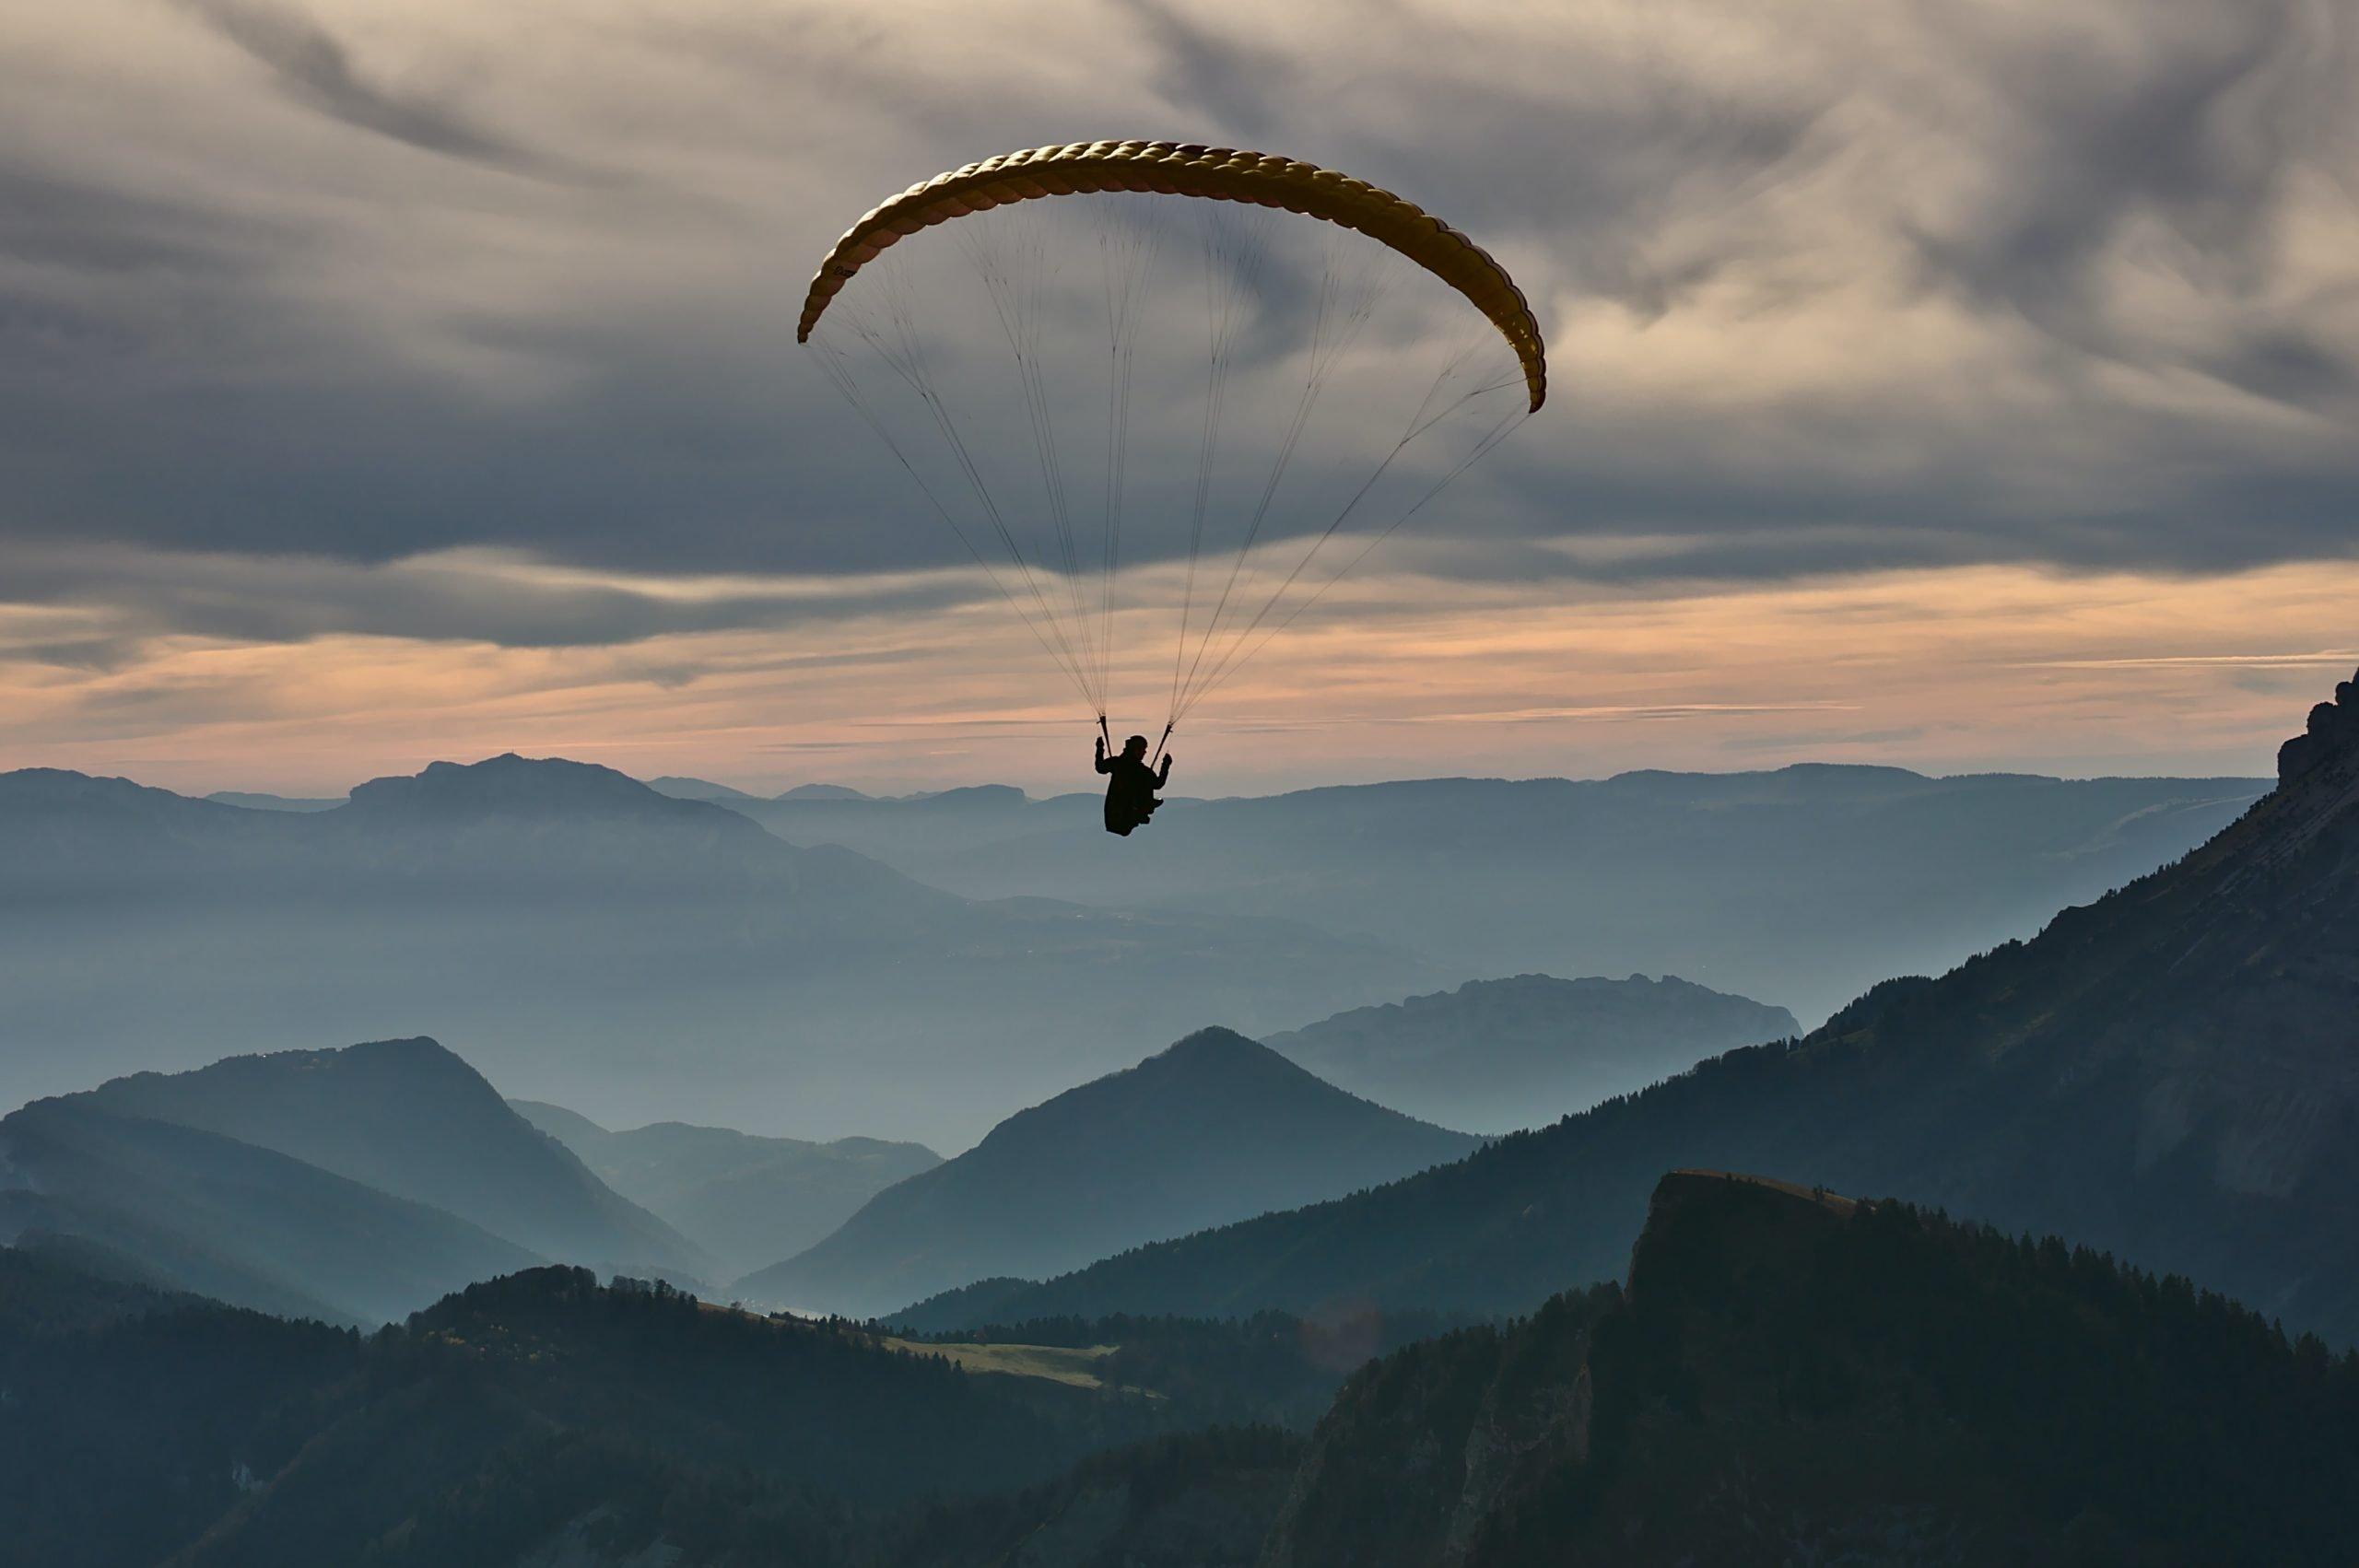 Paracadutarsi nell'infinito